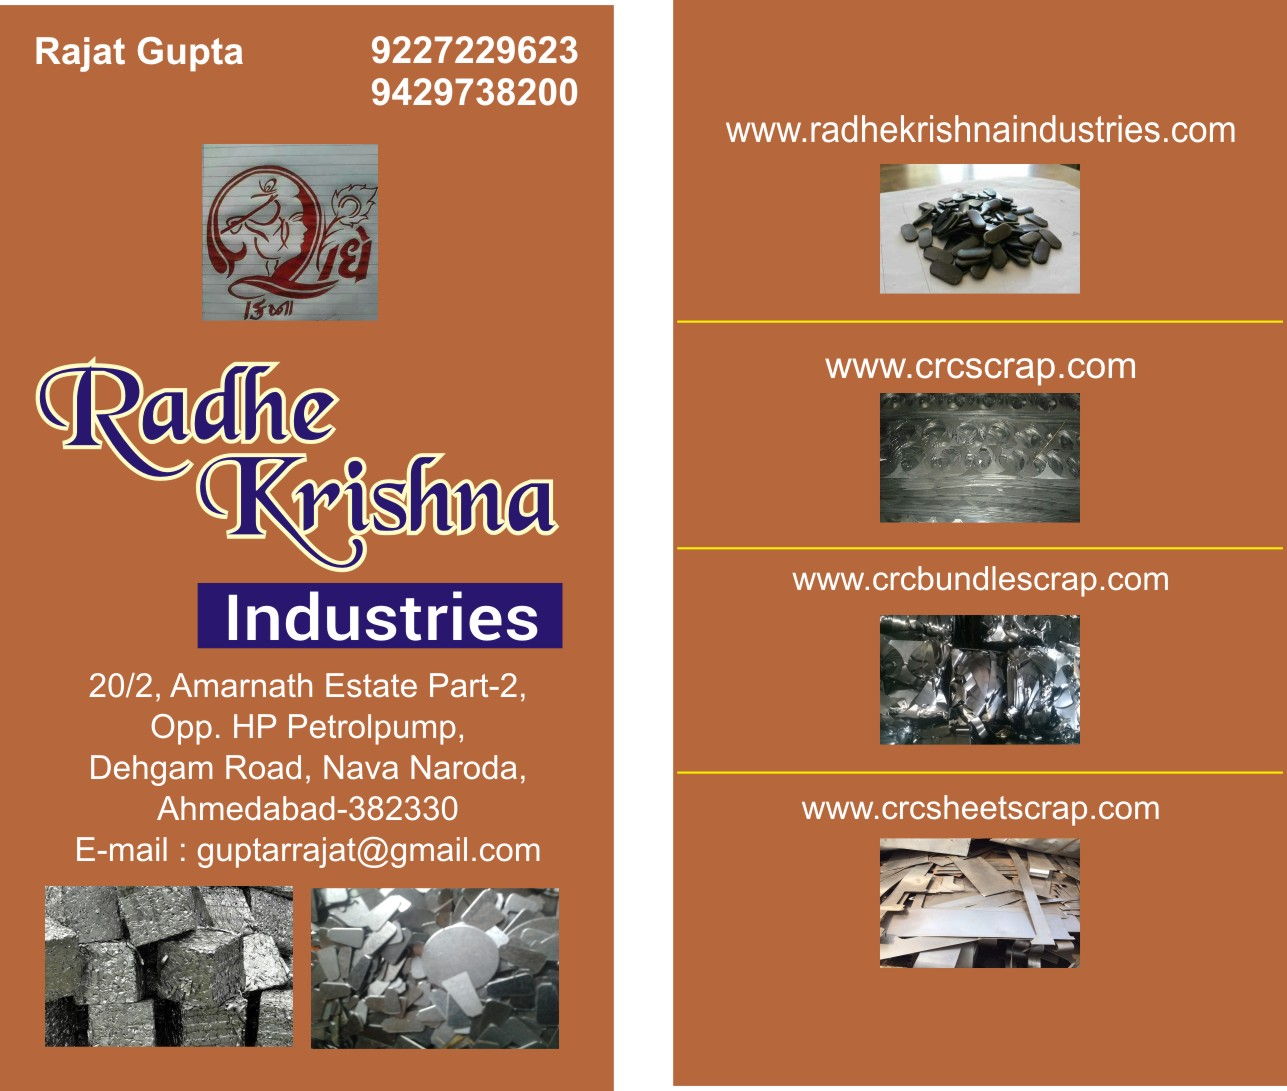 Radhe Krishna Industries